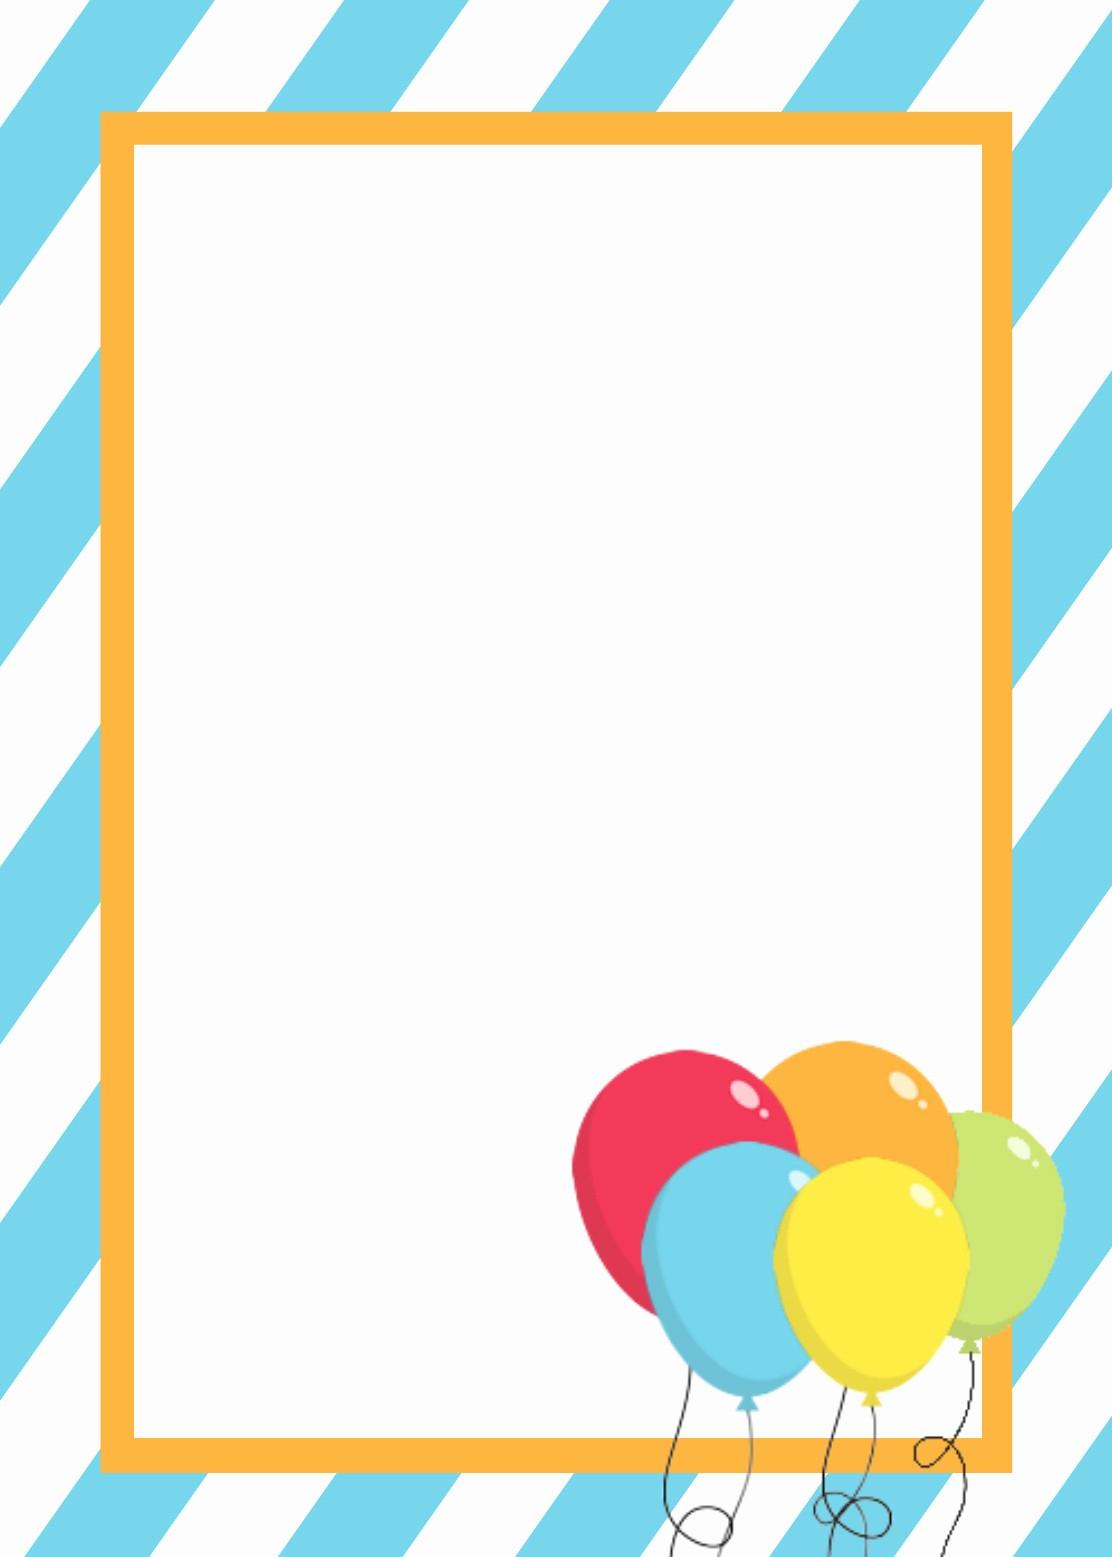 Kids Birthday Party Invite Templates Fresh Free Printable Birthday Invitation Templates